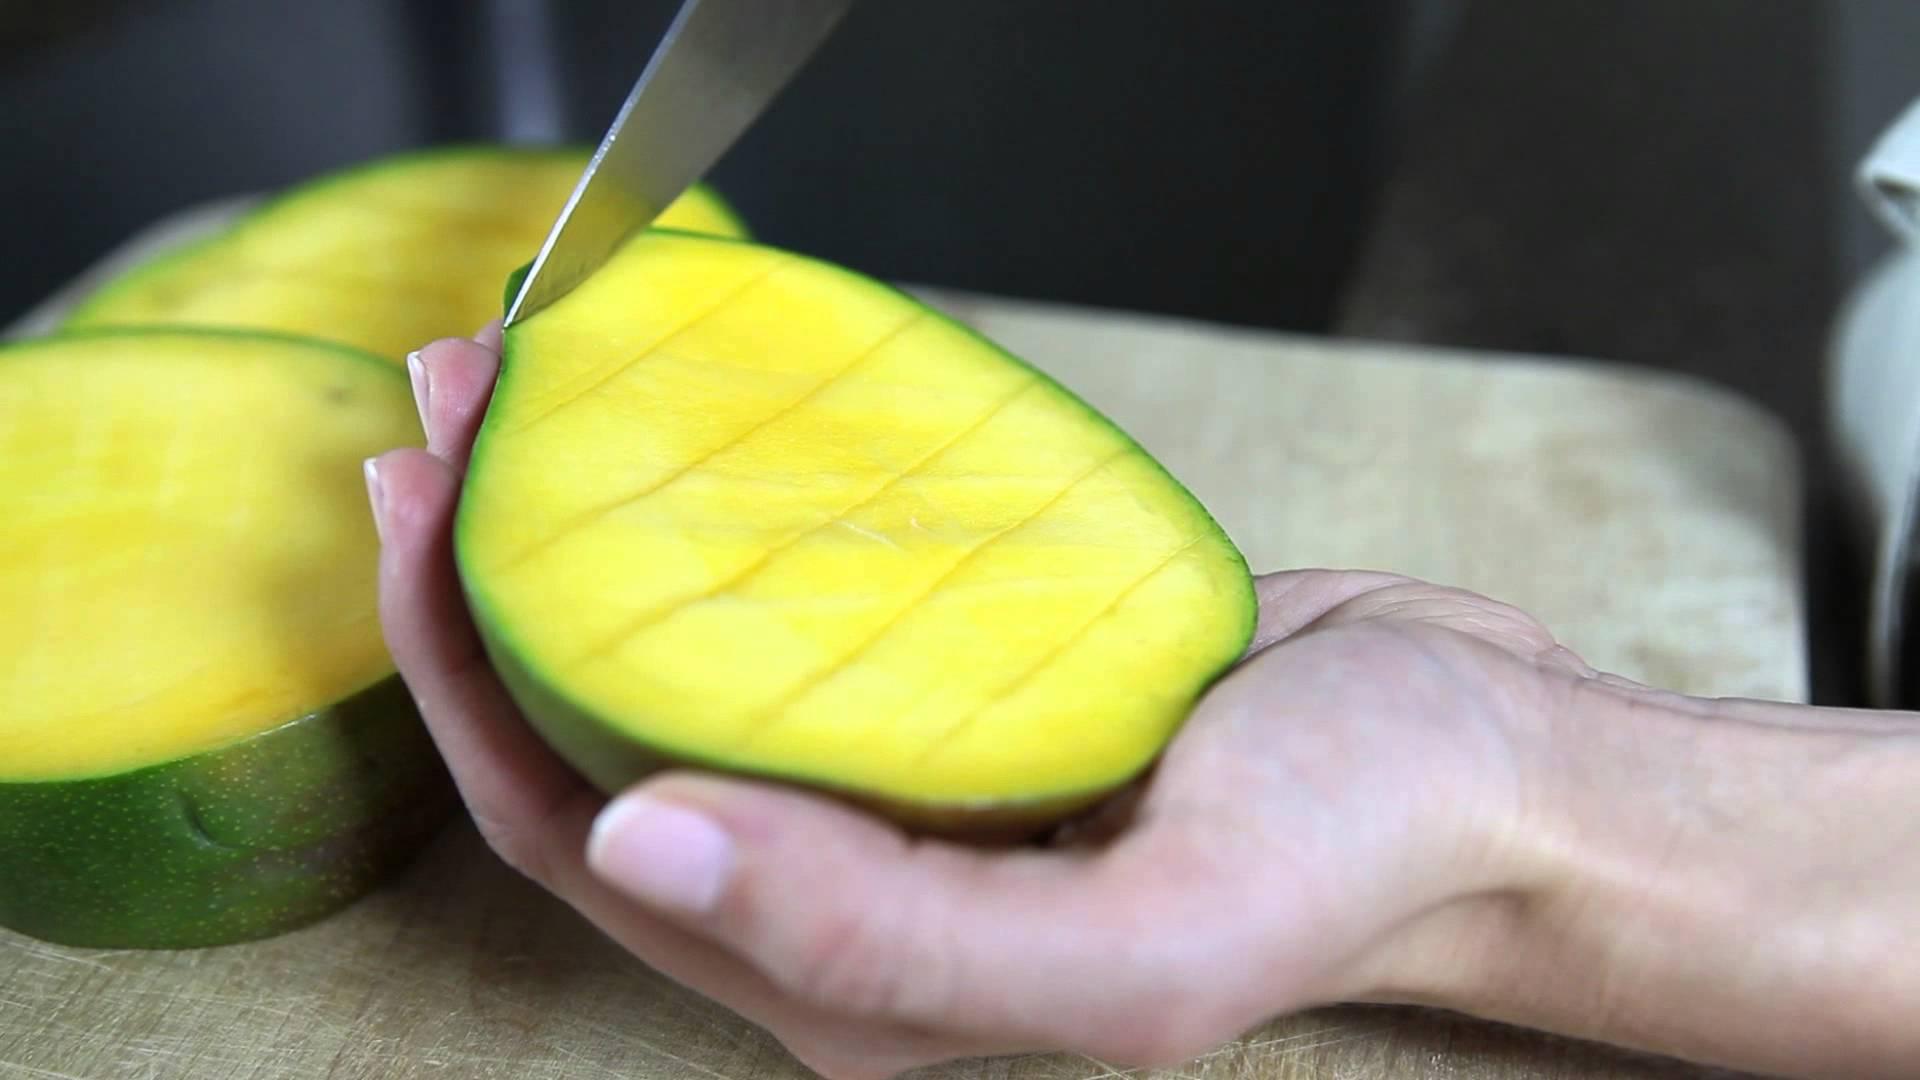 How To Cut A Mango Cooking Tips & Tricks Contis Mango Bravo